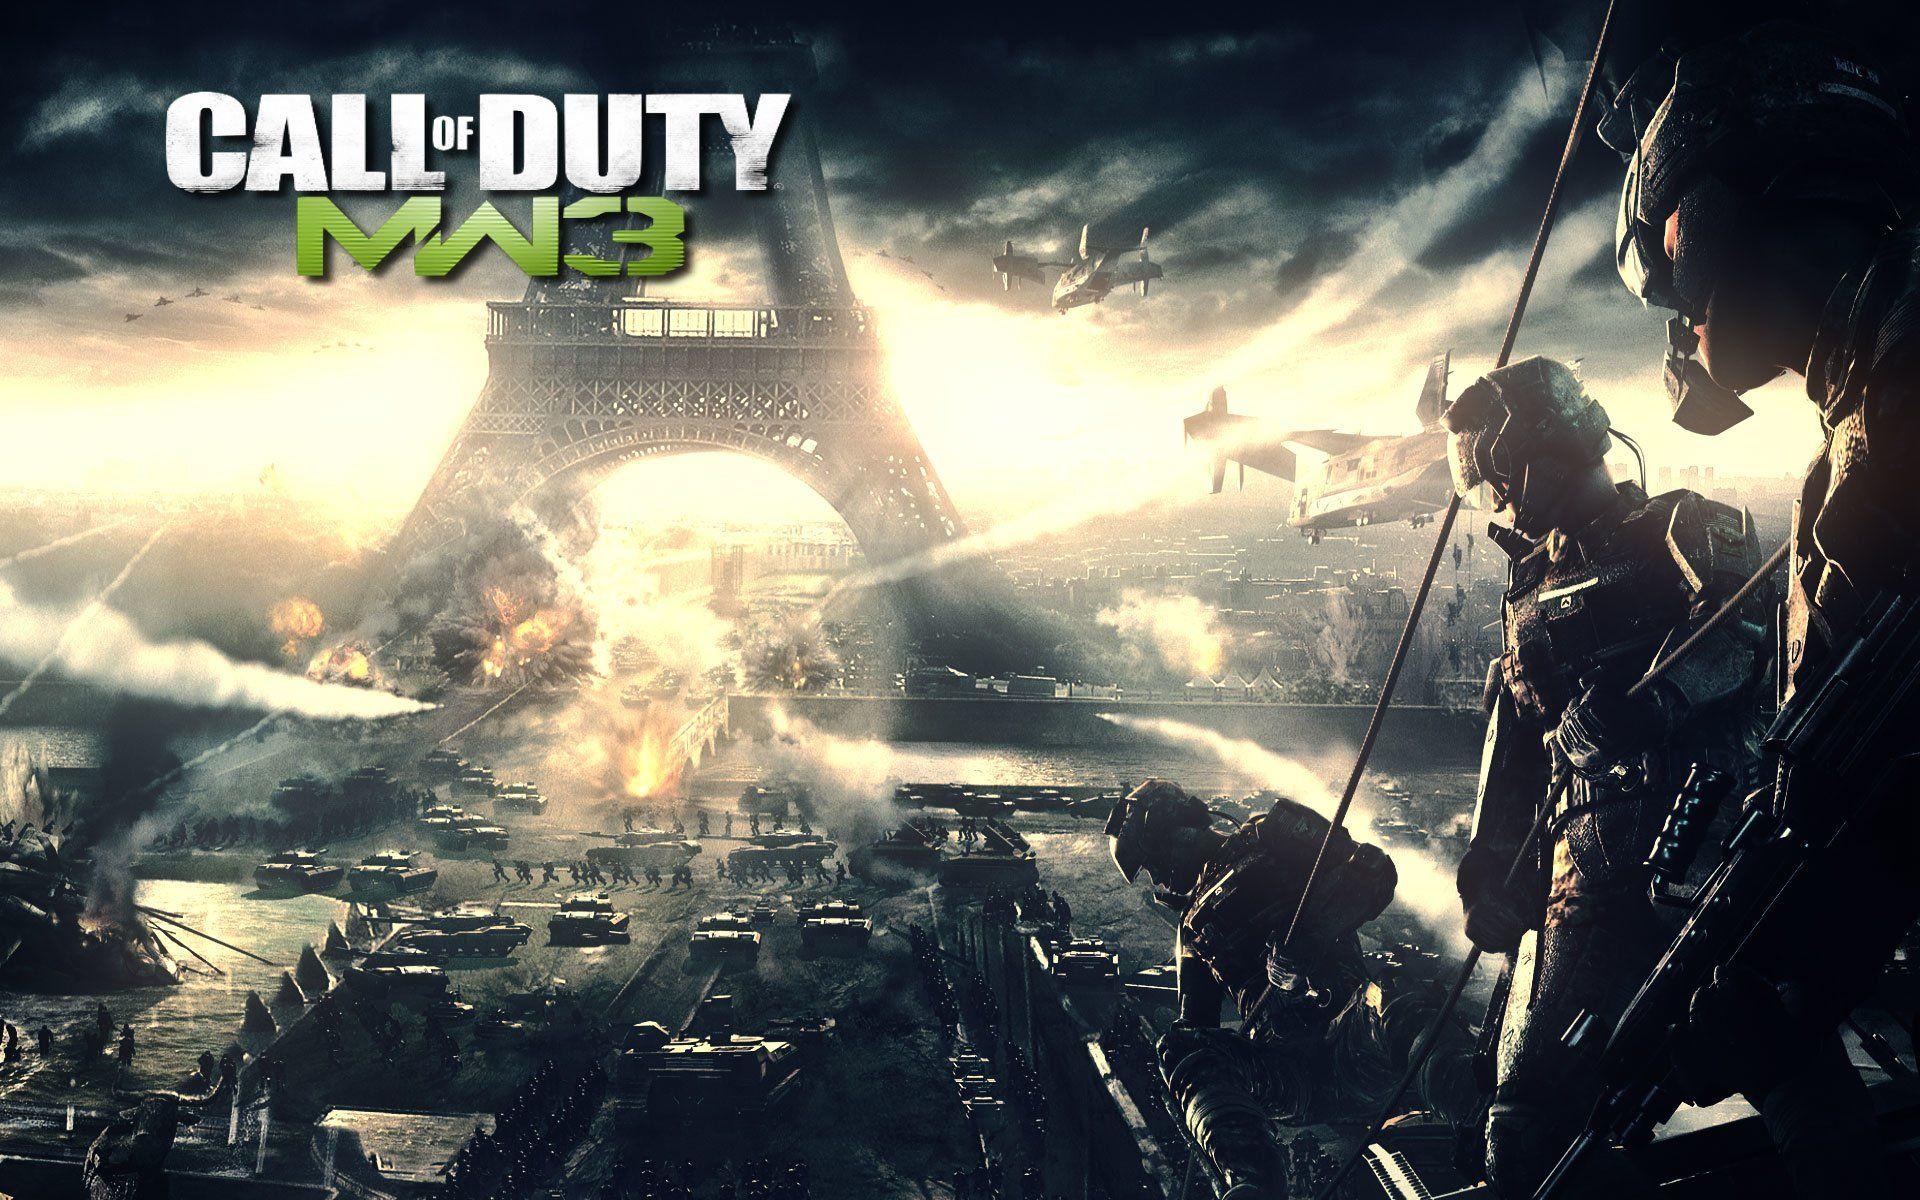 26 Call Of Duty Modern Warfare 3 Hd Wallpapers Background Images Call Of Duty Modern Warfare Best Games